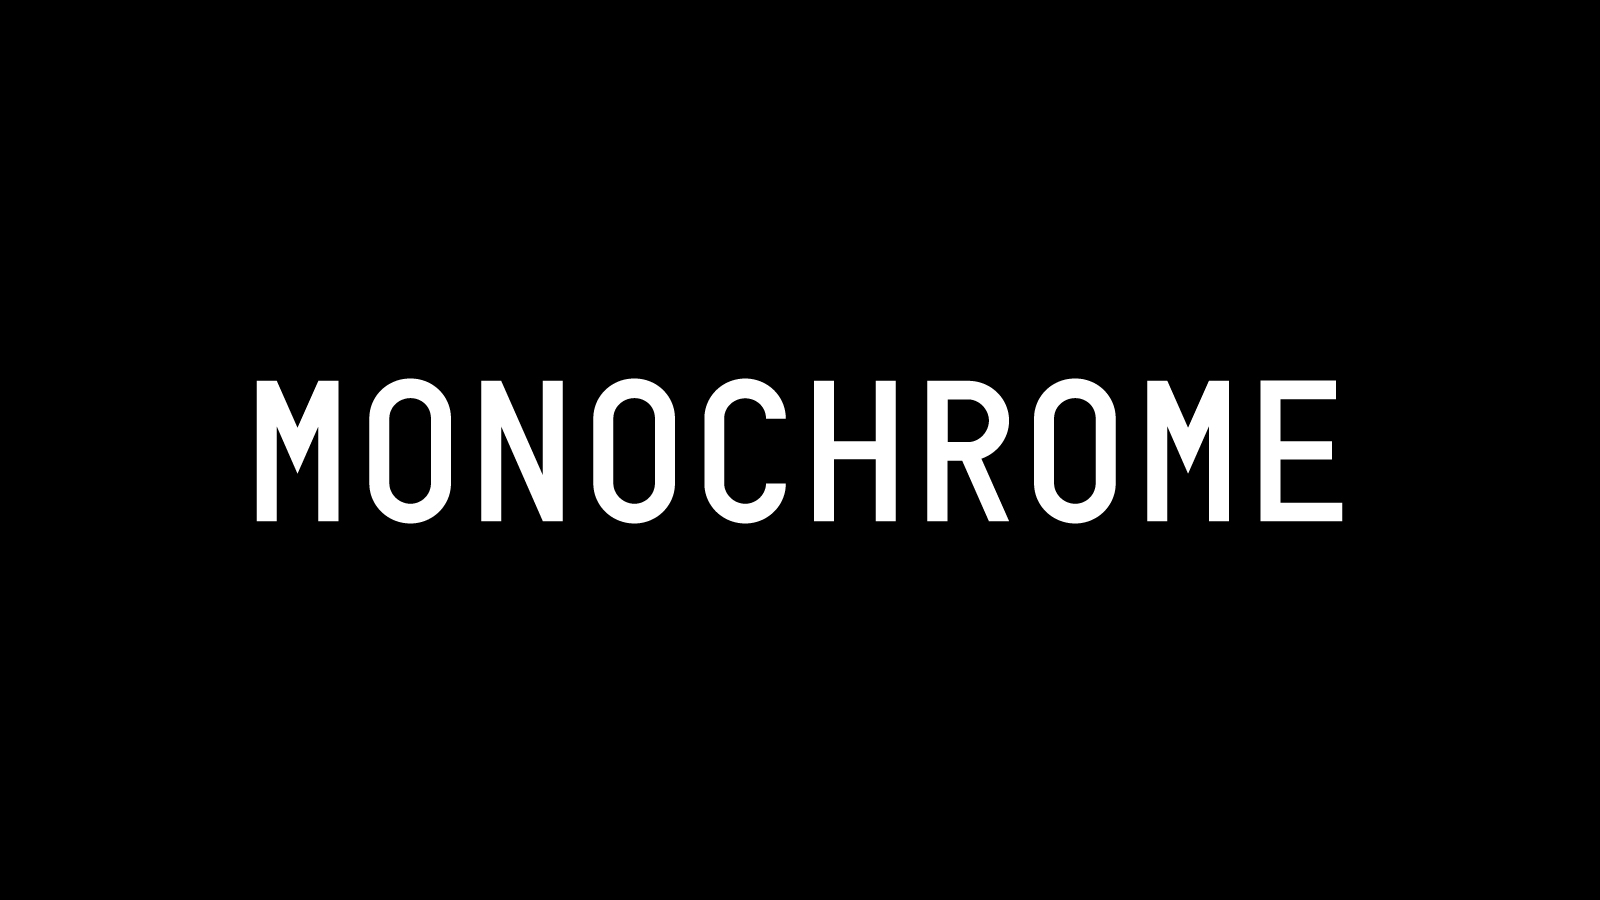 monochrome_logo_1600.jpg